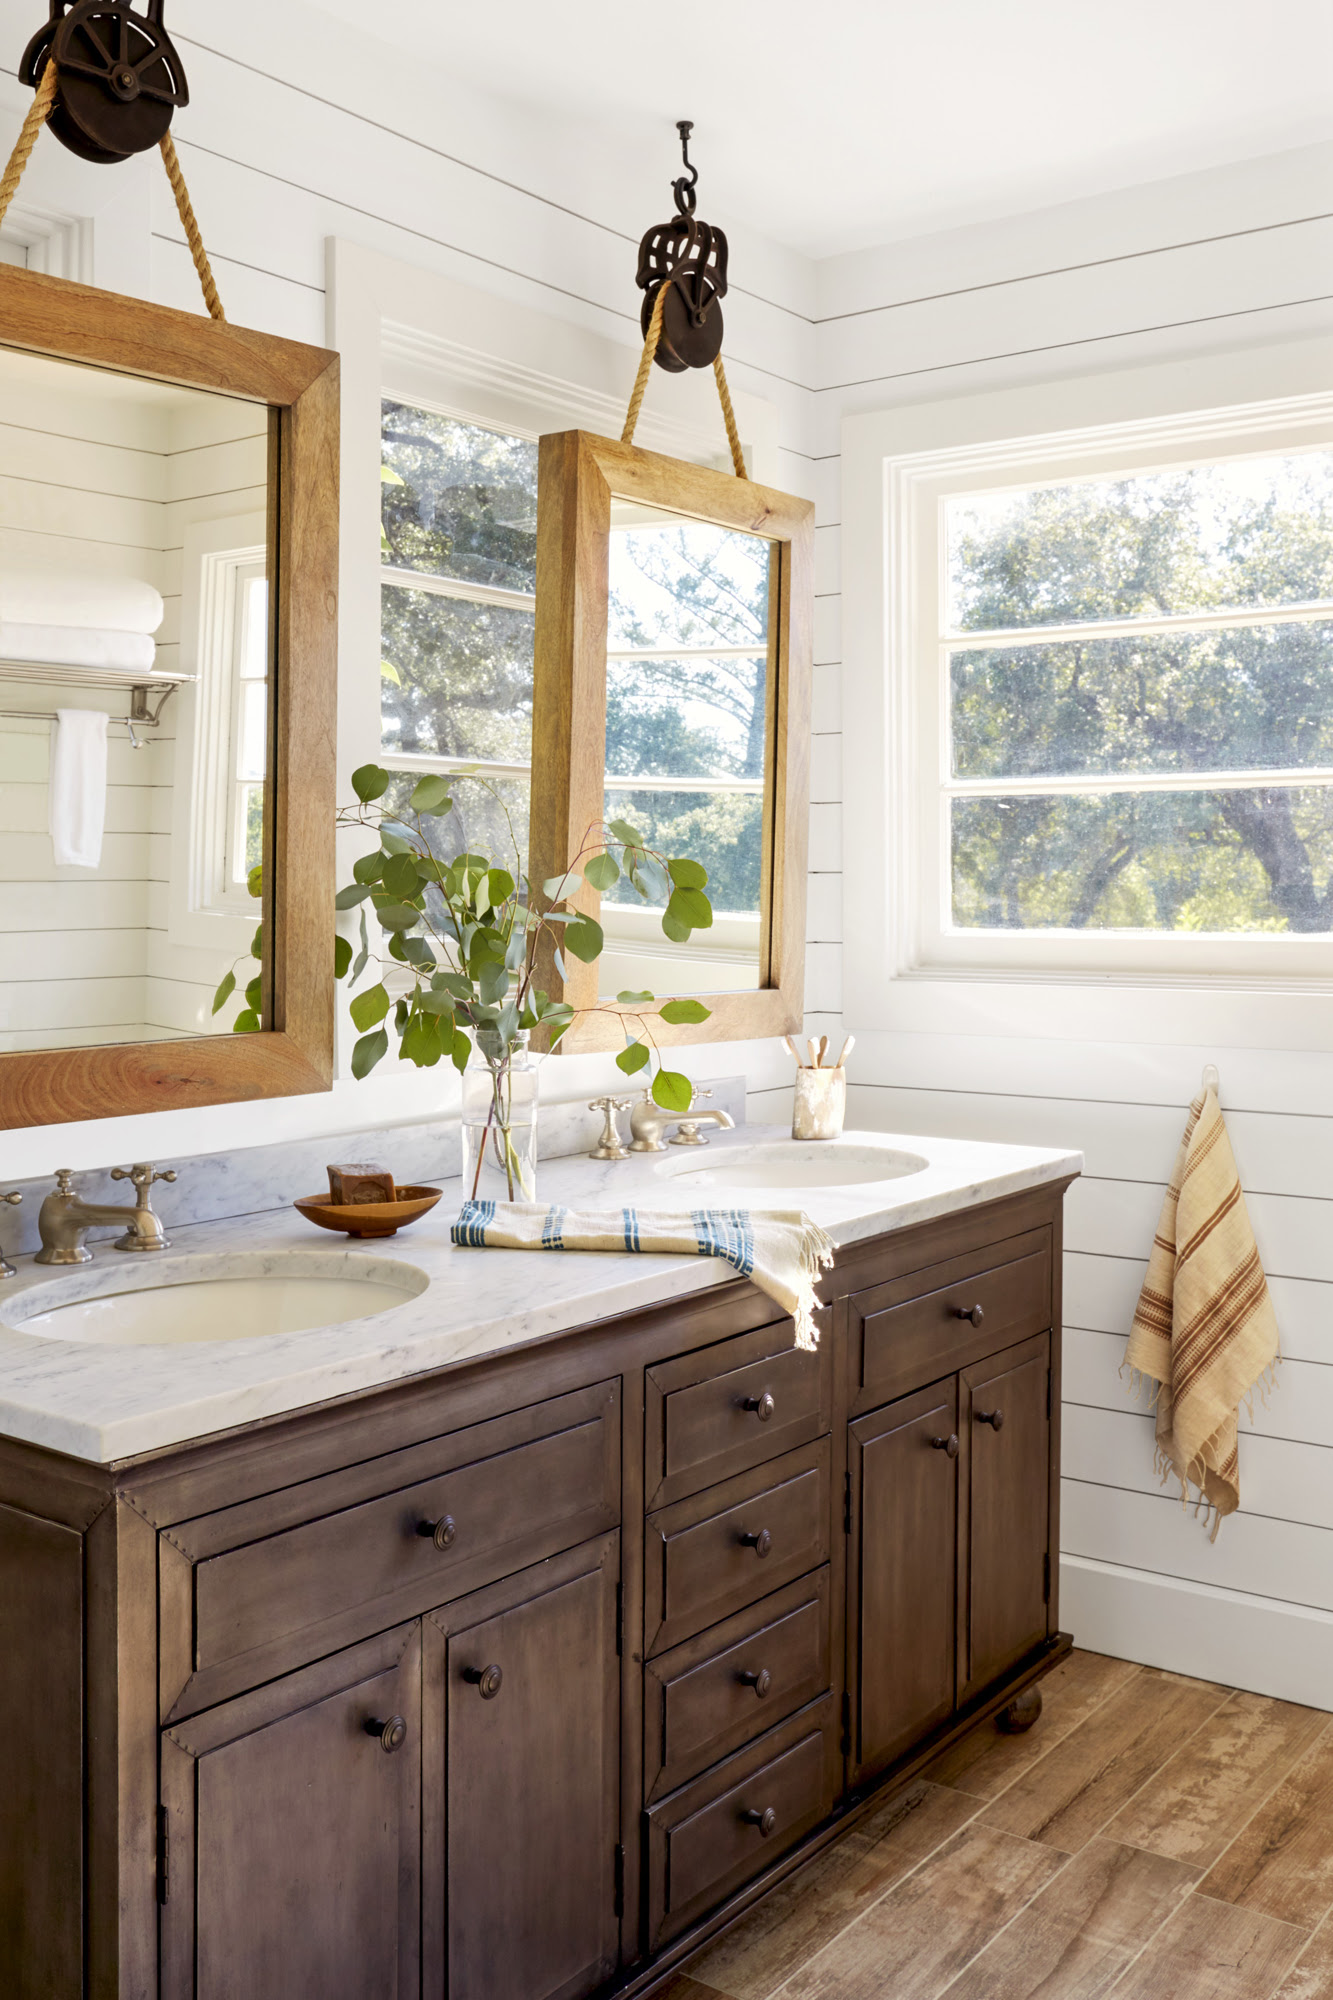 23 Bathroom Decorating Ideas - Pictures of Bathroom Decor ...